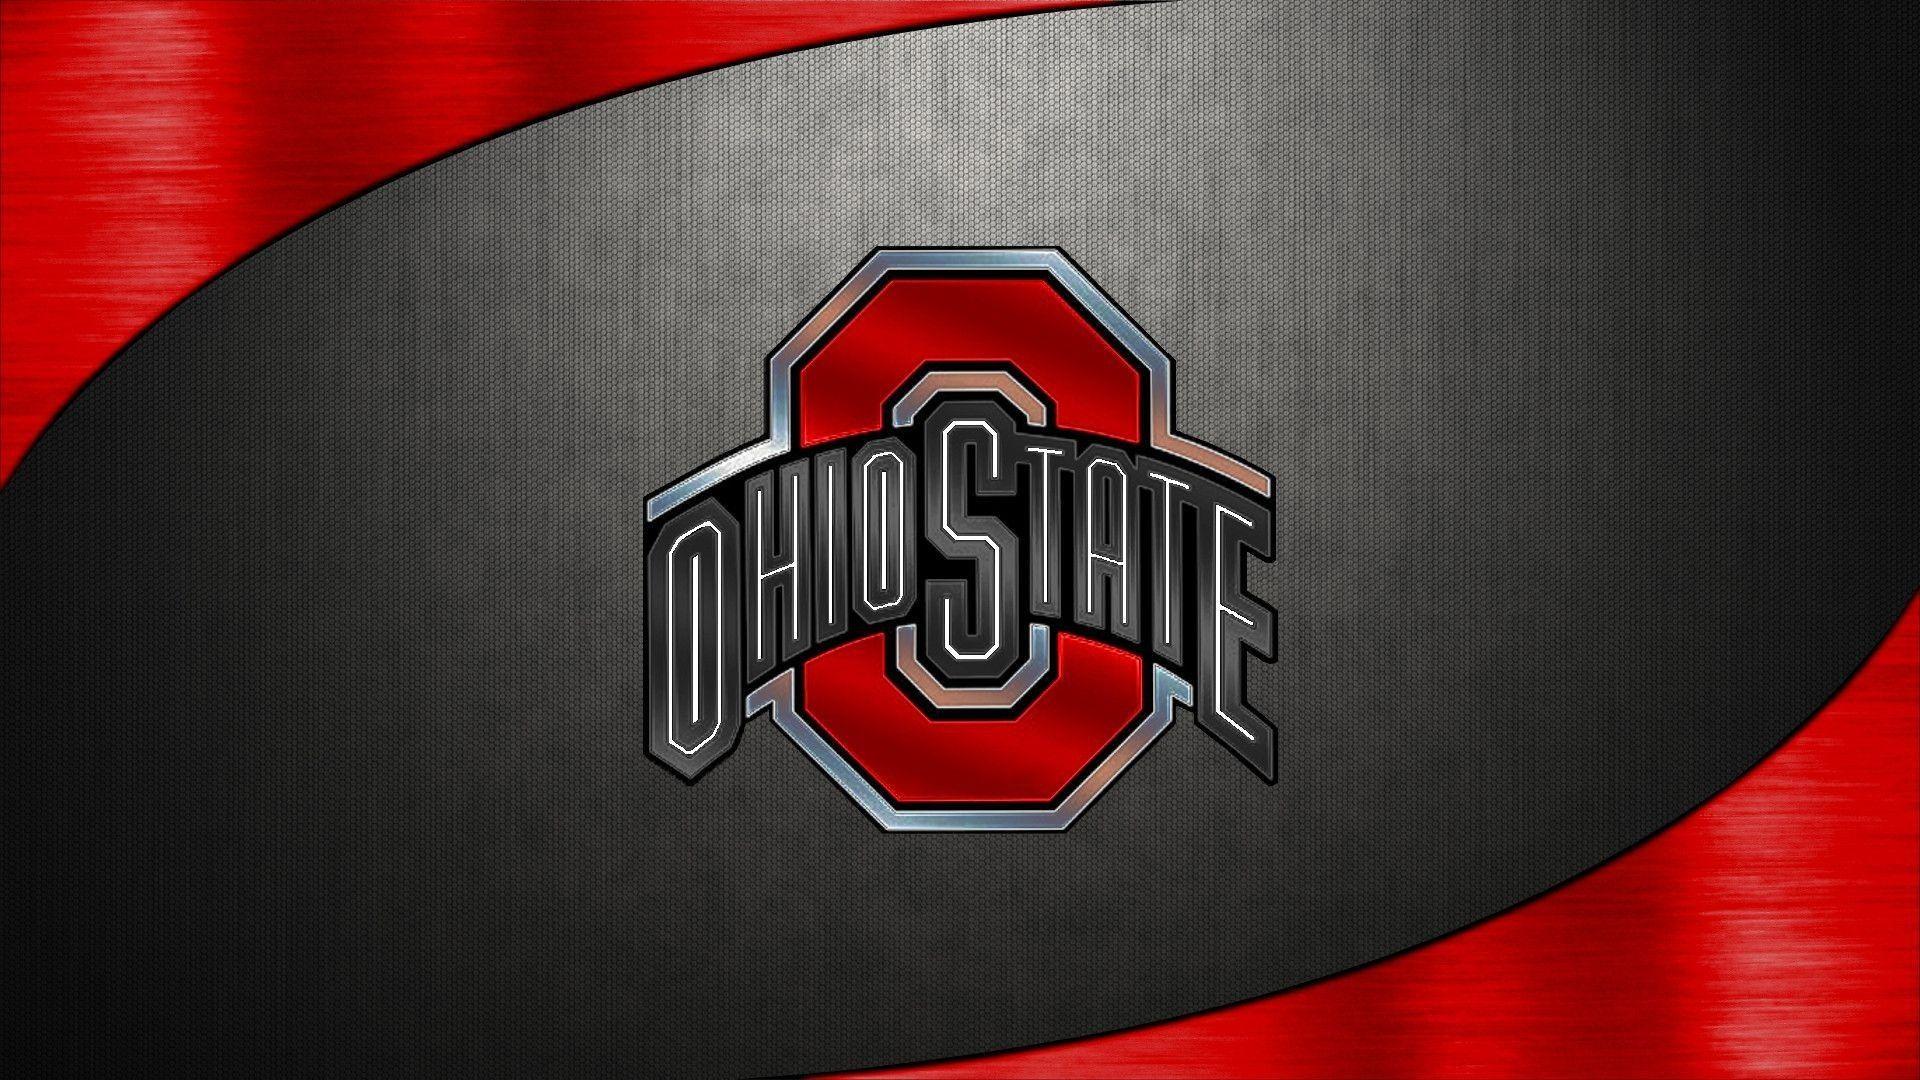 Ohio State Buckeyes Football Wallpaper Ohio state